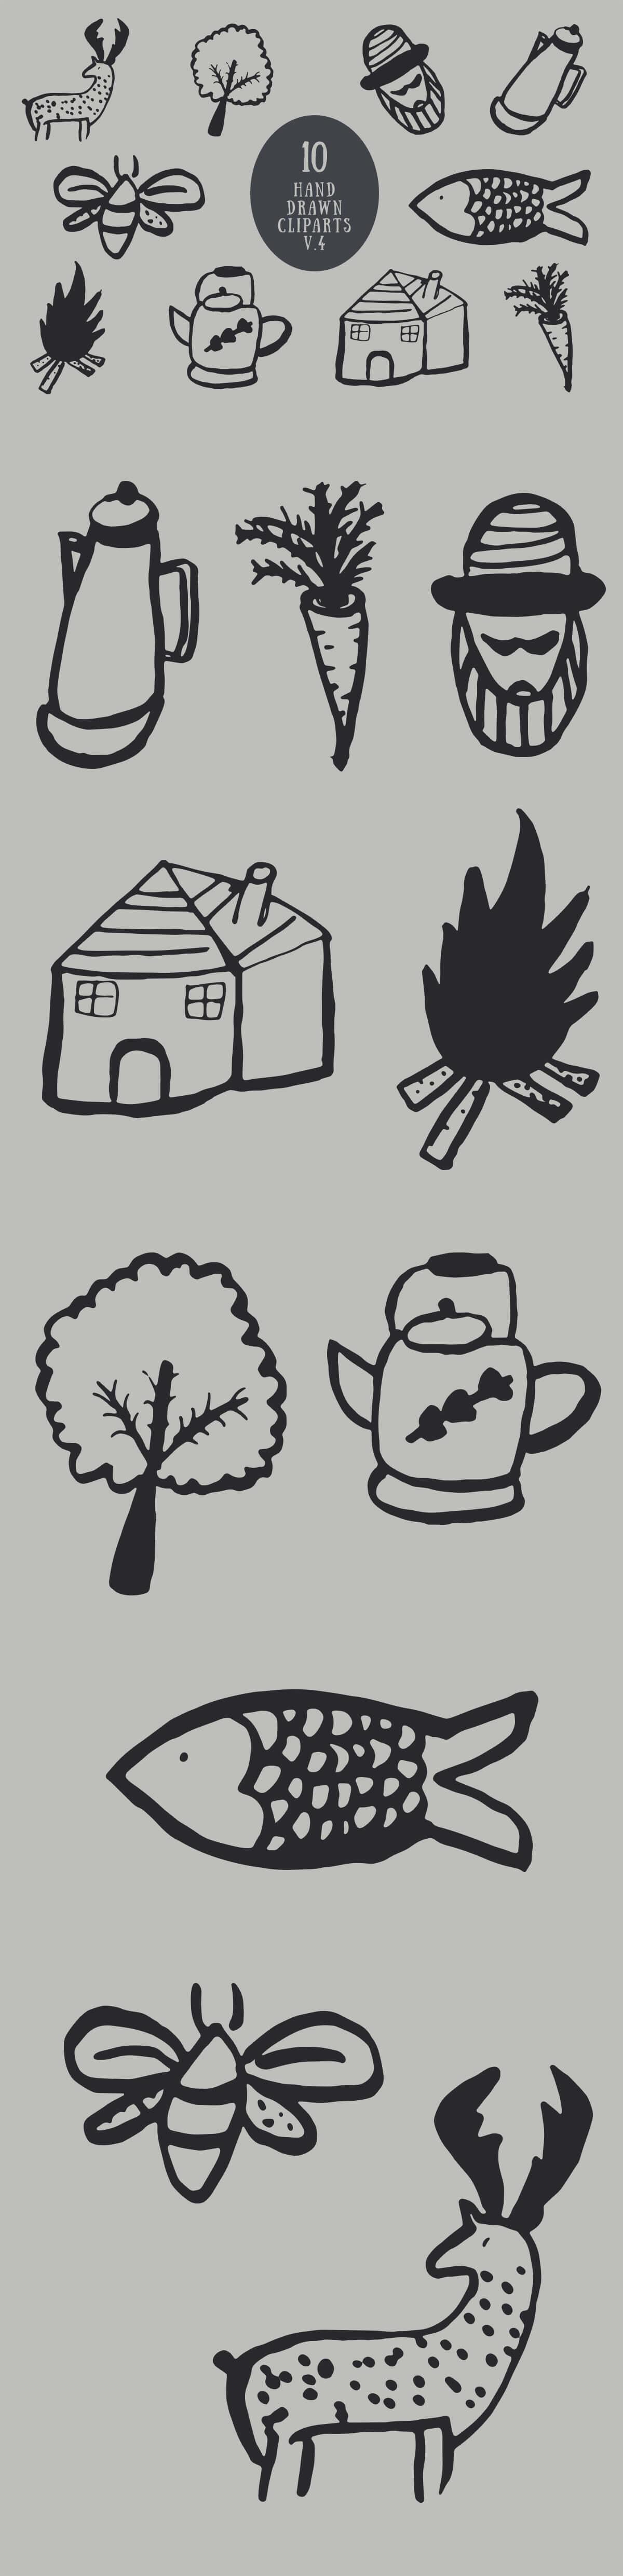 Free Handmade Miscellaneous Cliparts V4